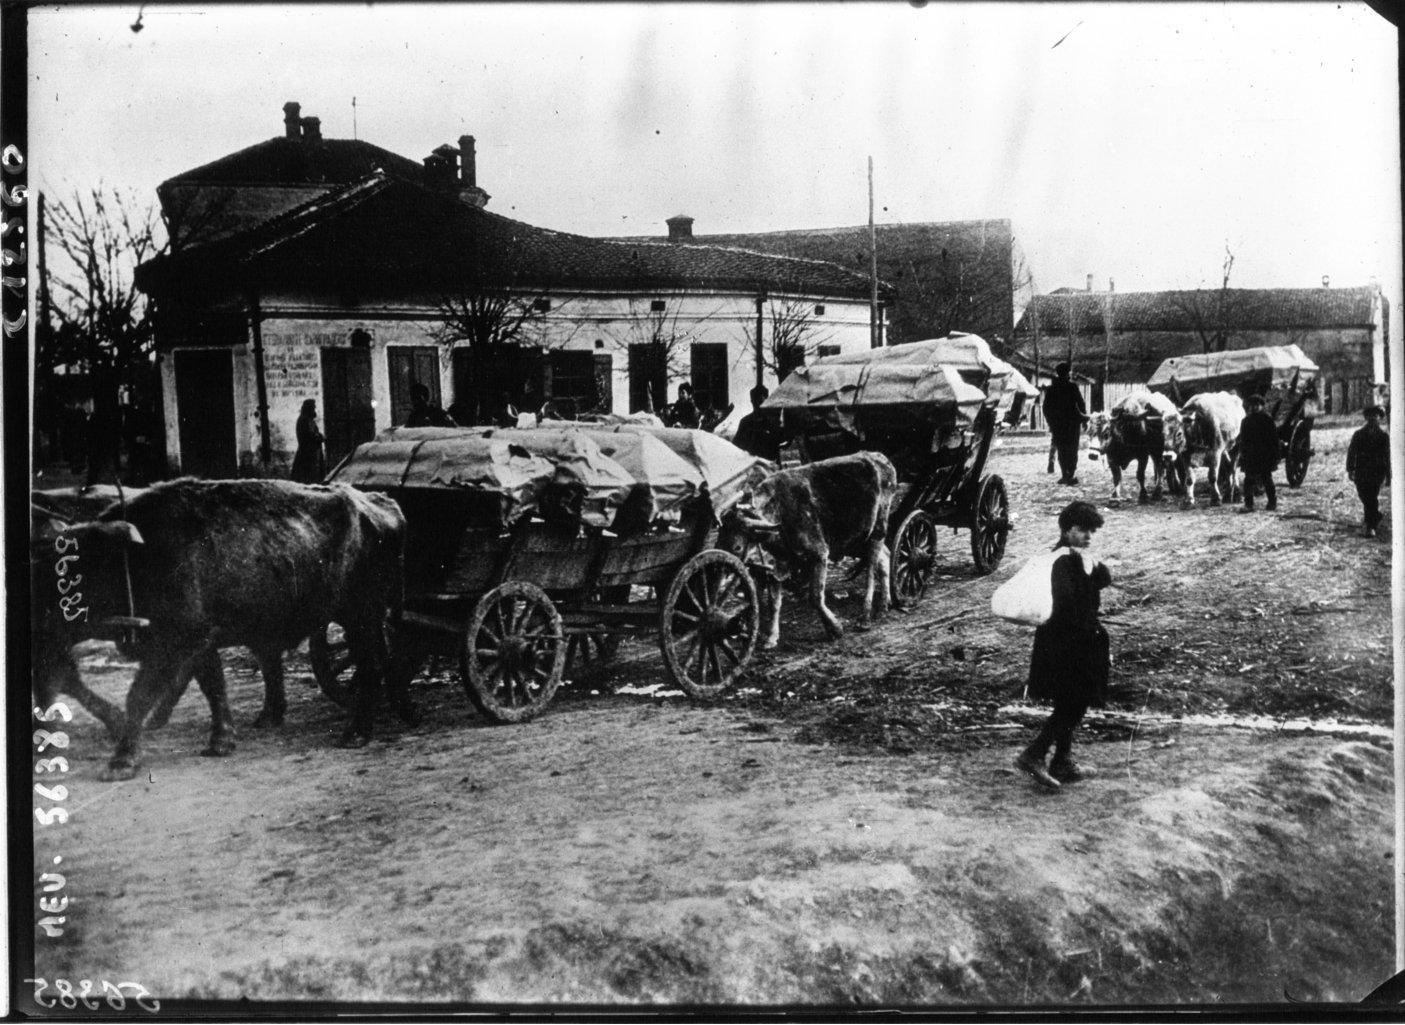 Transportation of typhus victims